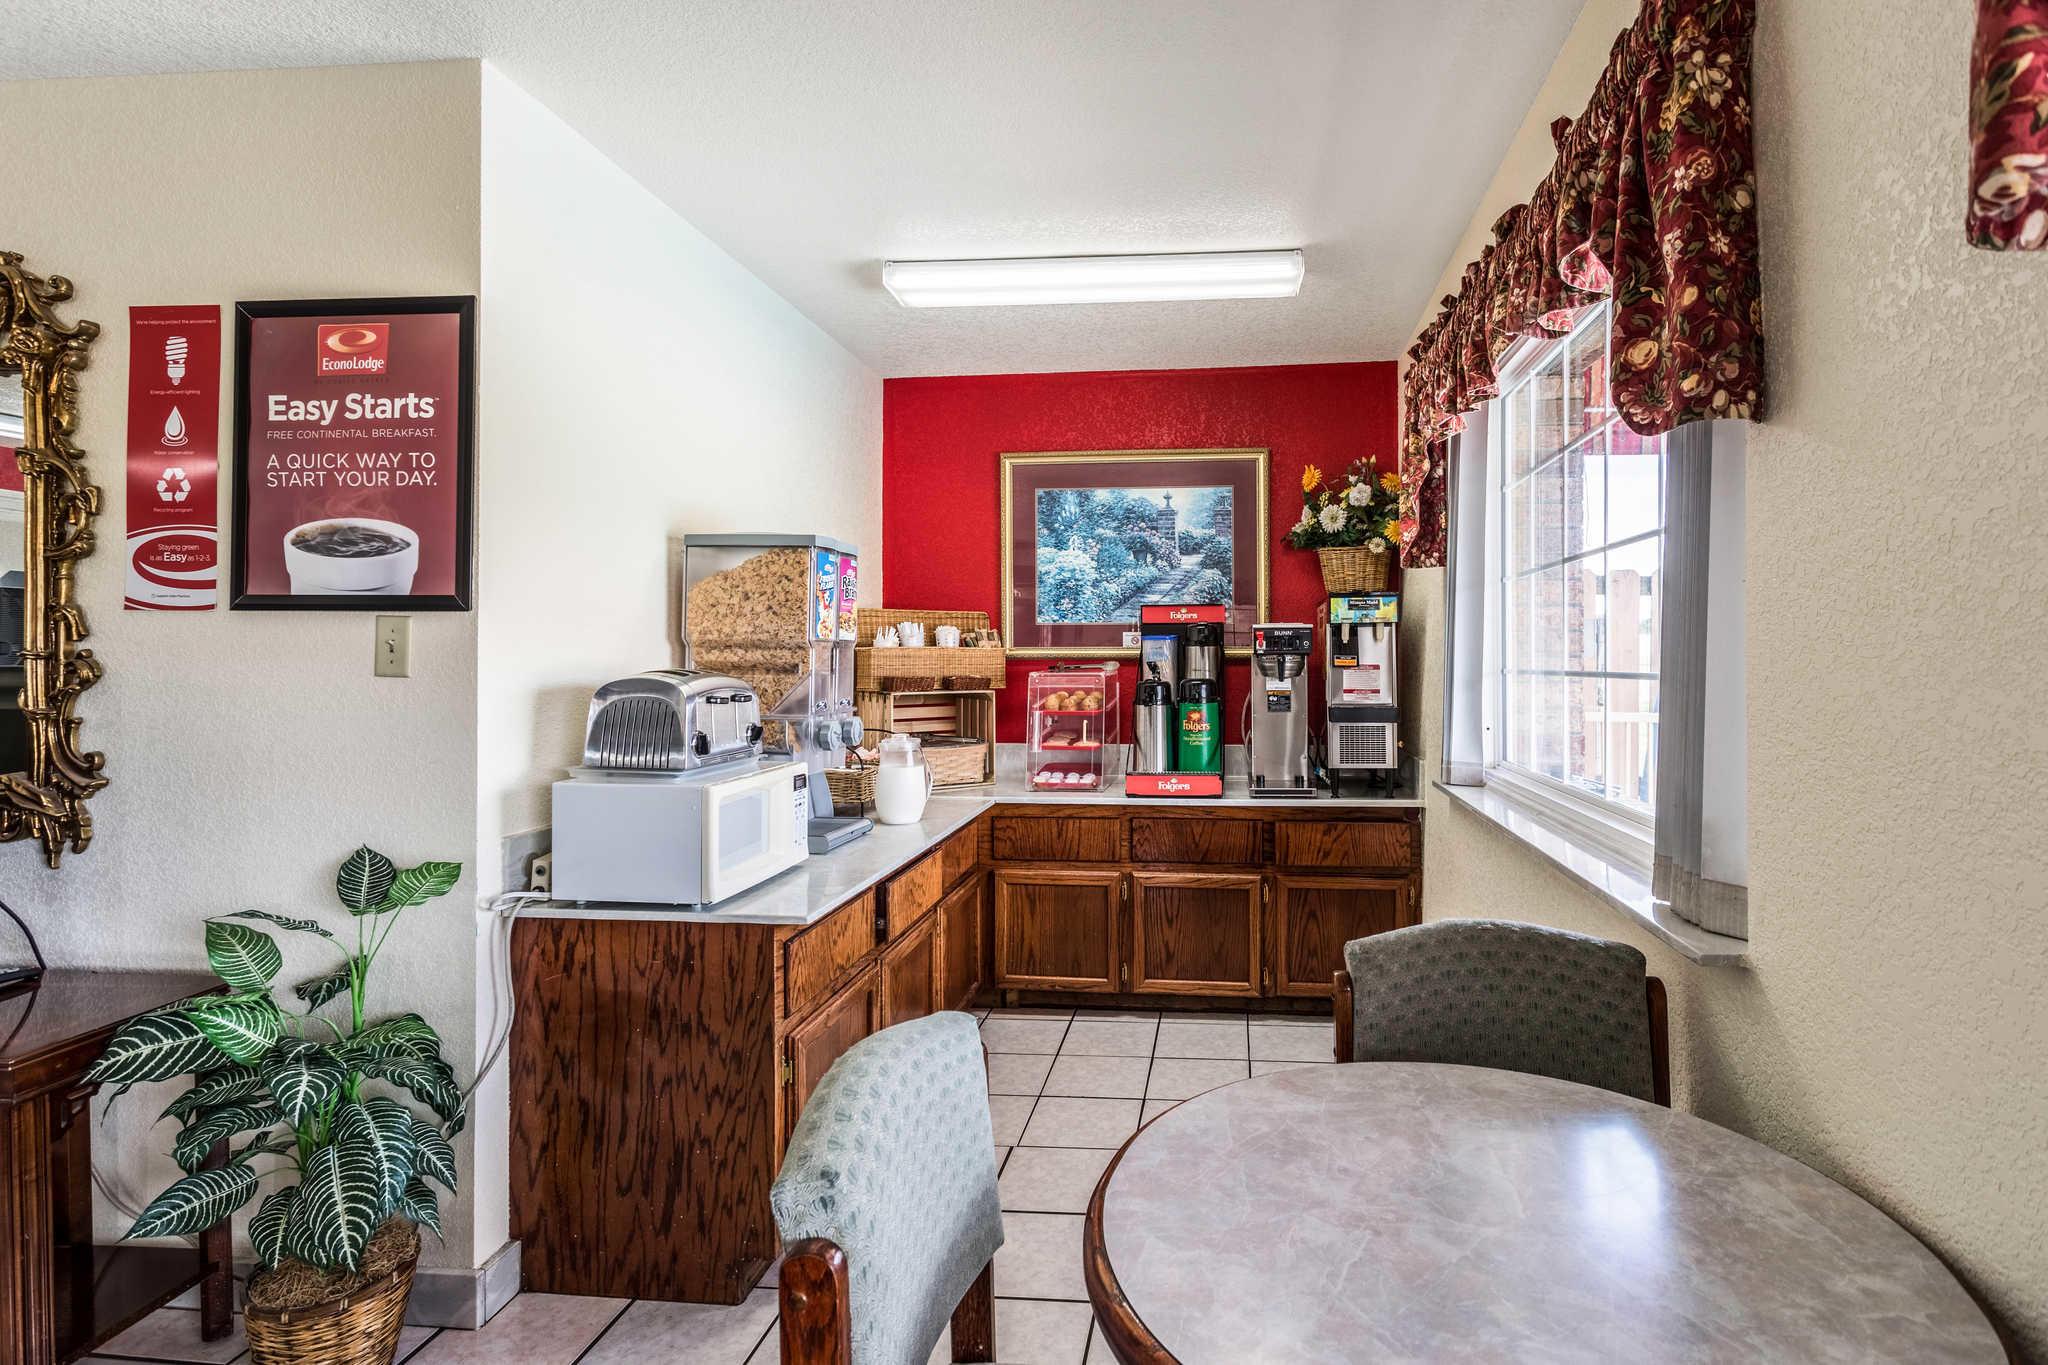 Econo Lodge & Suites image 21